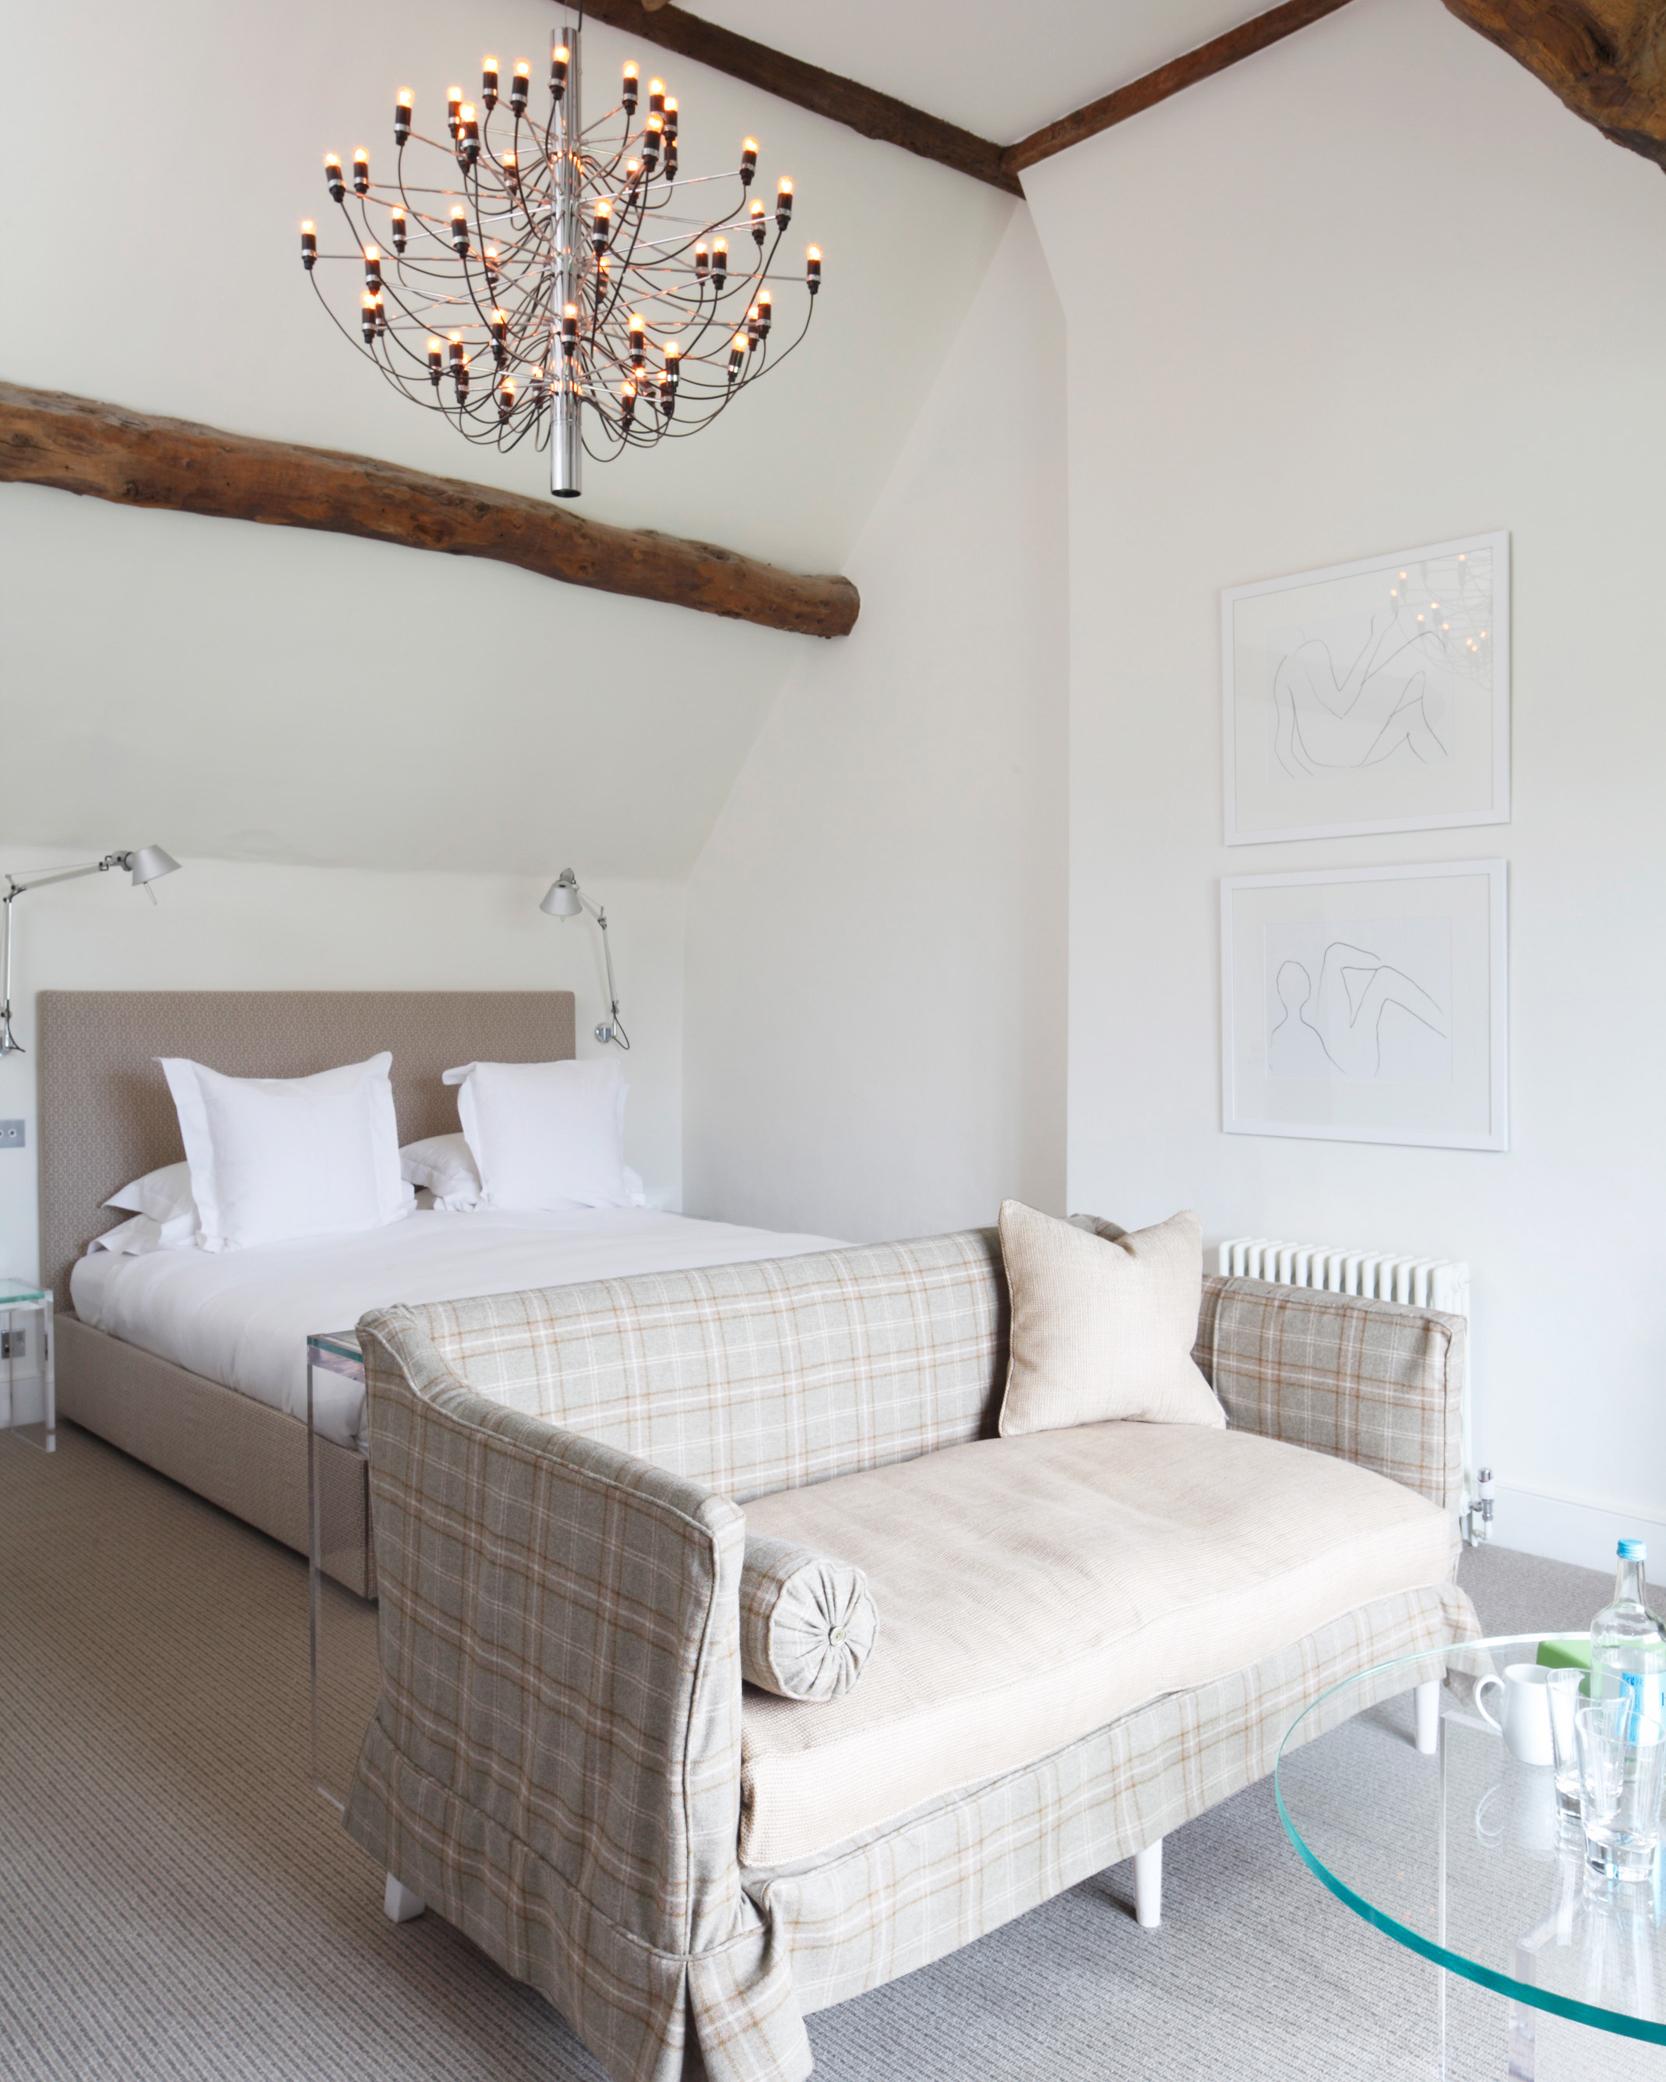 mrmrssmith-romantic-proposals-cotswalds-barnsley-house-1014.jpg